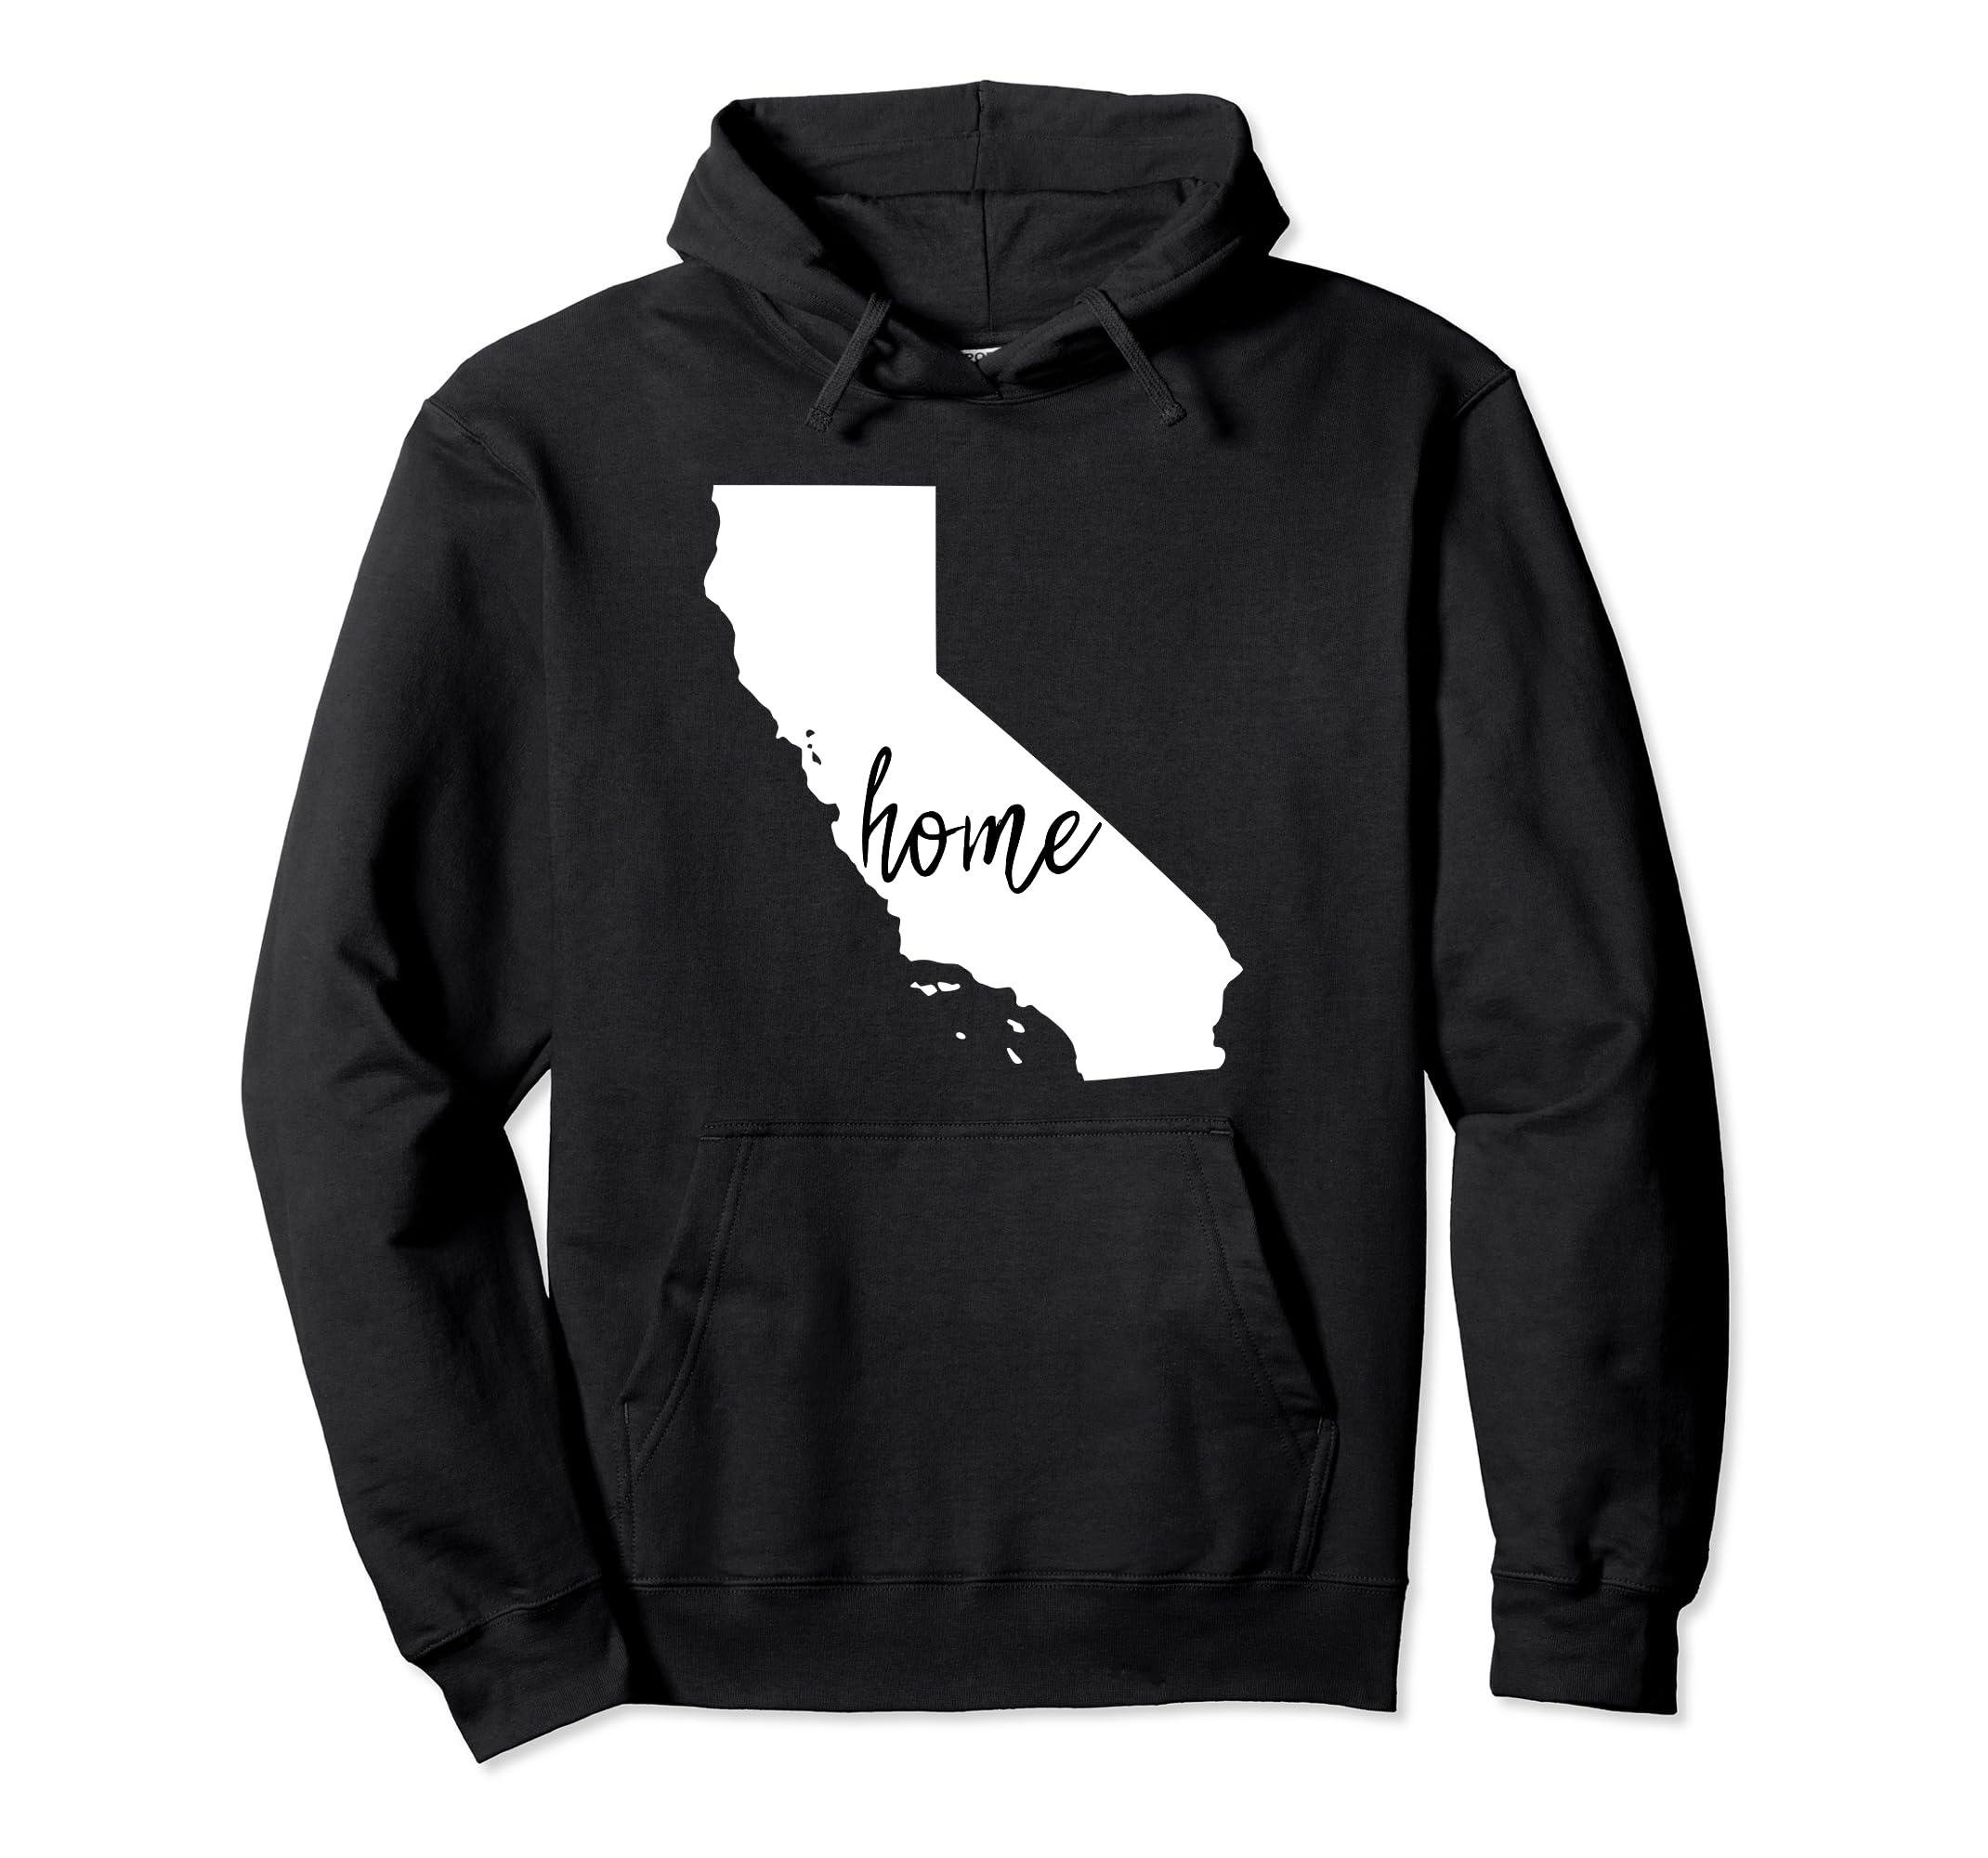 California Hoodie, California Home Hoodie,-Colonhue